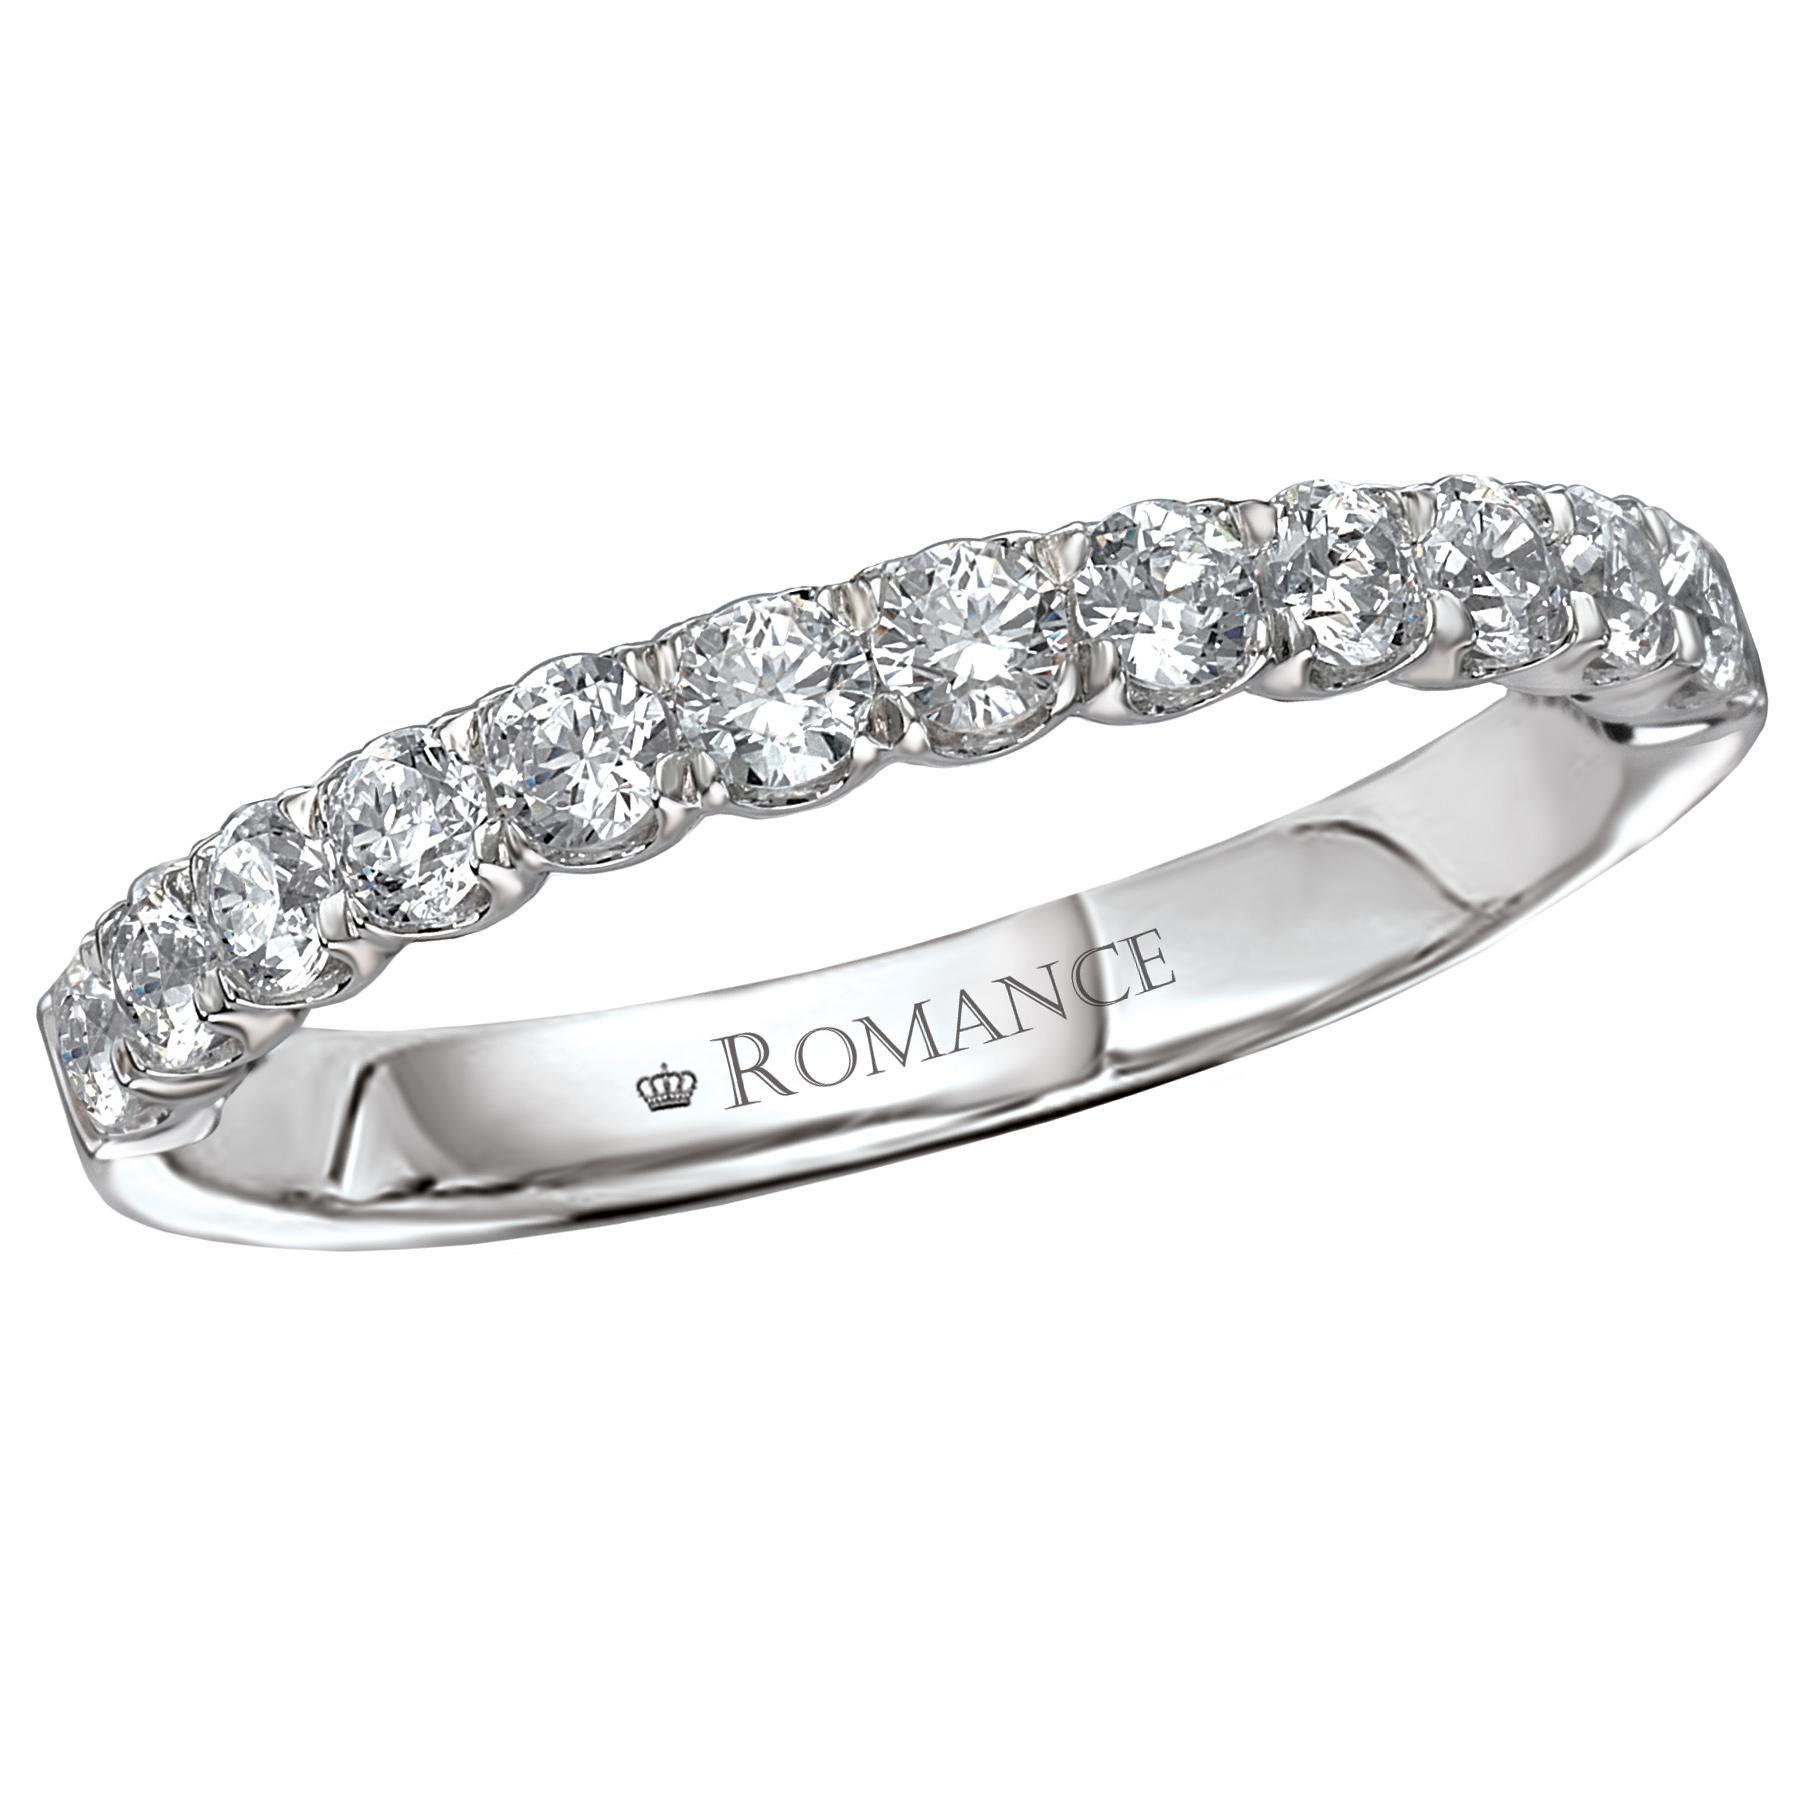 Romance Wedding Bands 117053-W product image